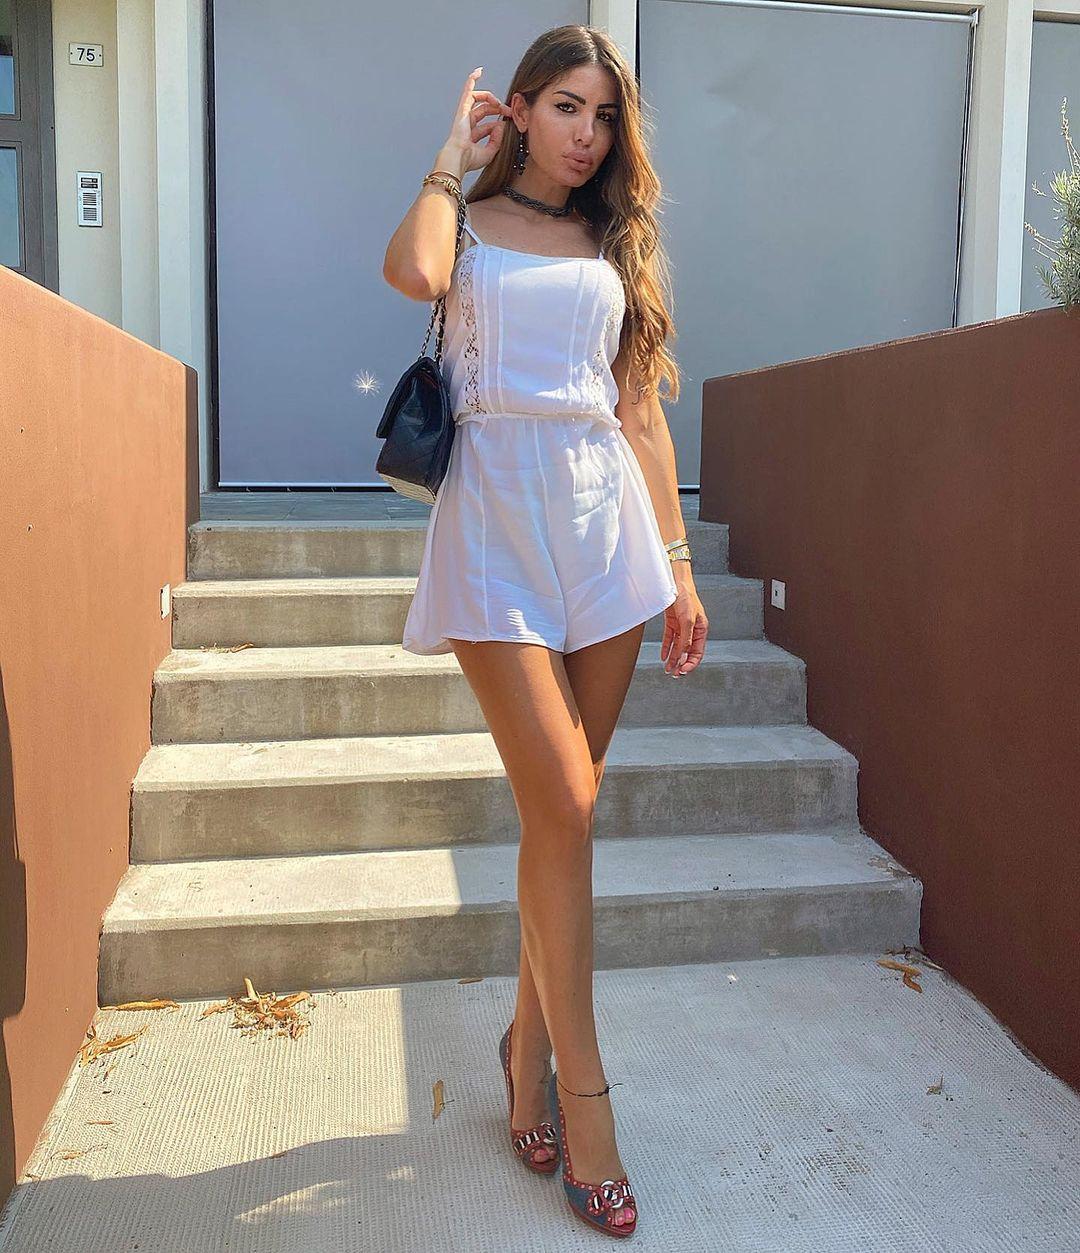 Jessica-Zanazzi-Wallpapers-Insta-Fit-Bio-1